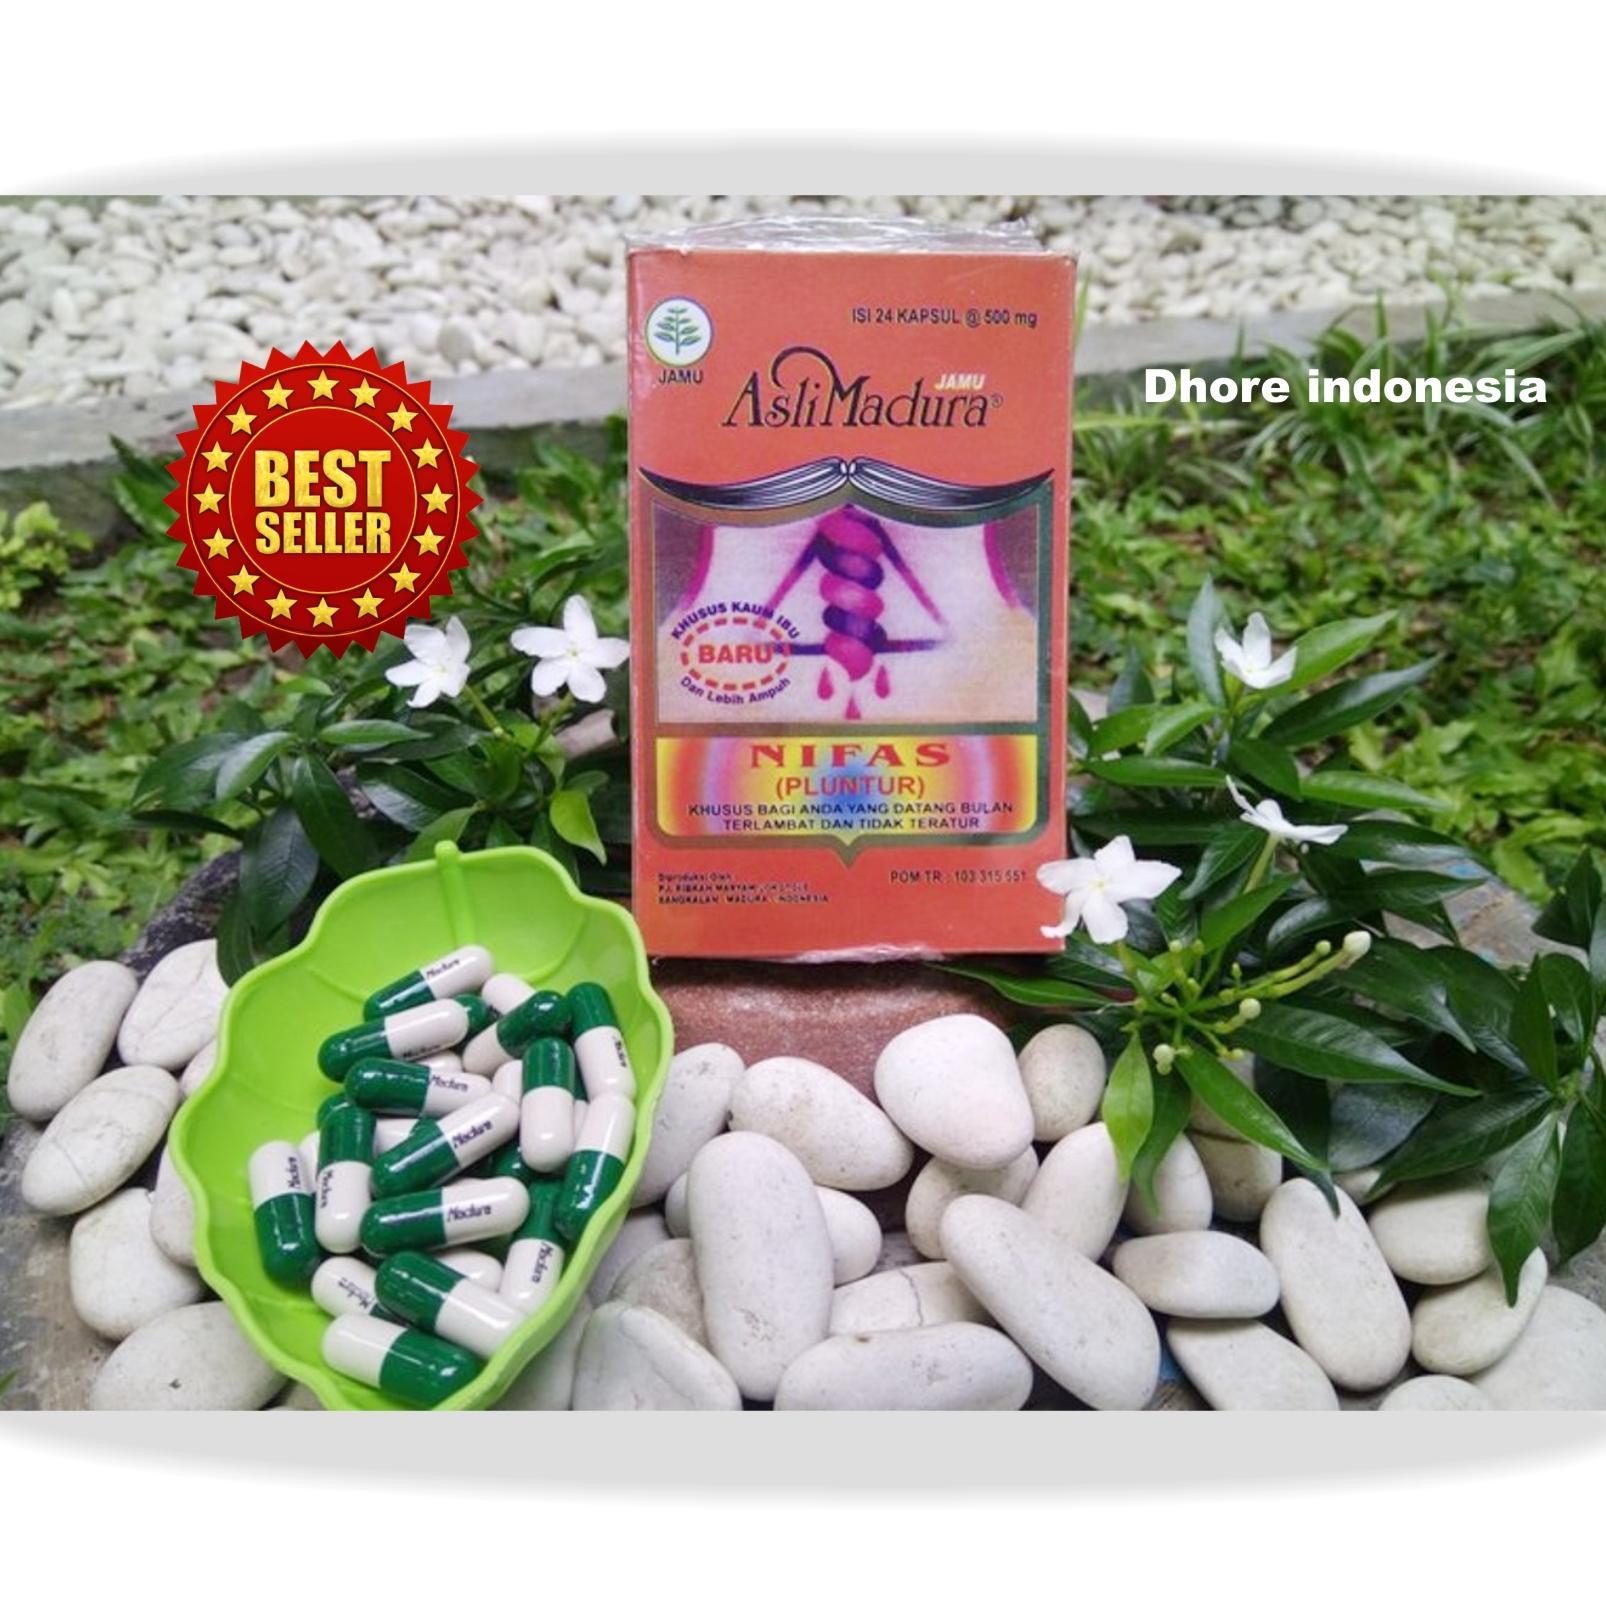 jamu mujarab – jamu peluntur/ obat haid / jamu teratur datang bulan / asli ramuan madura